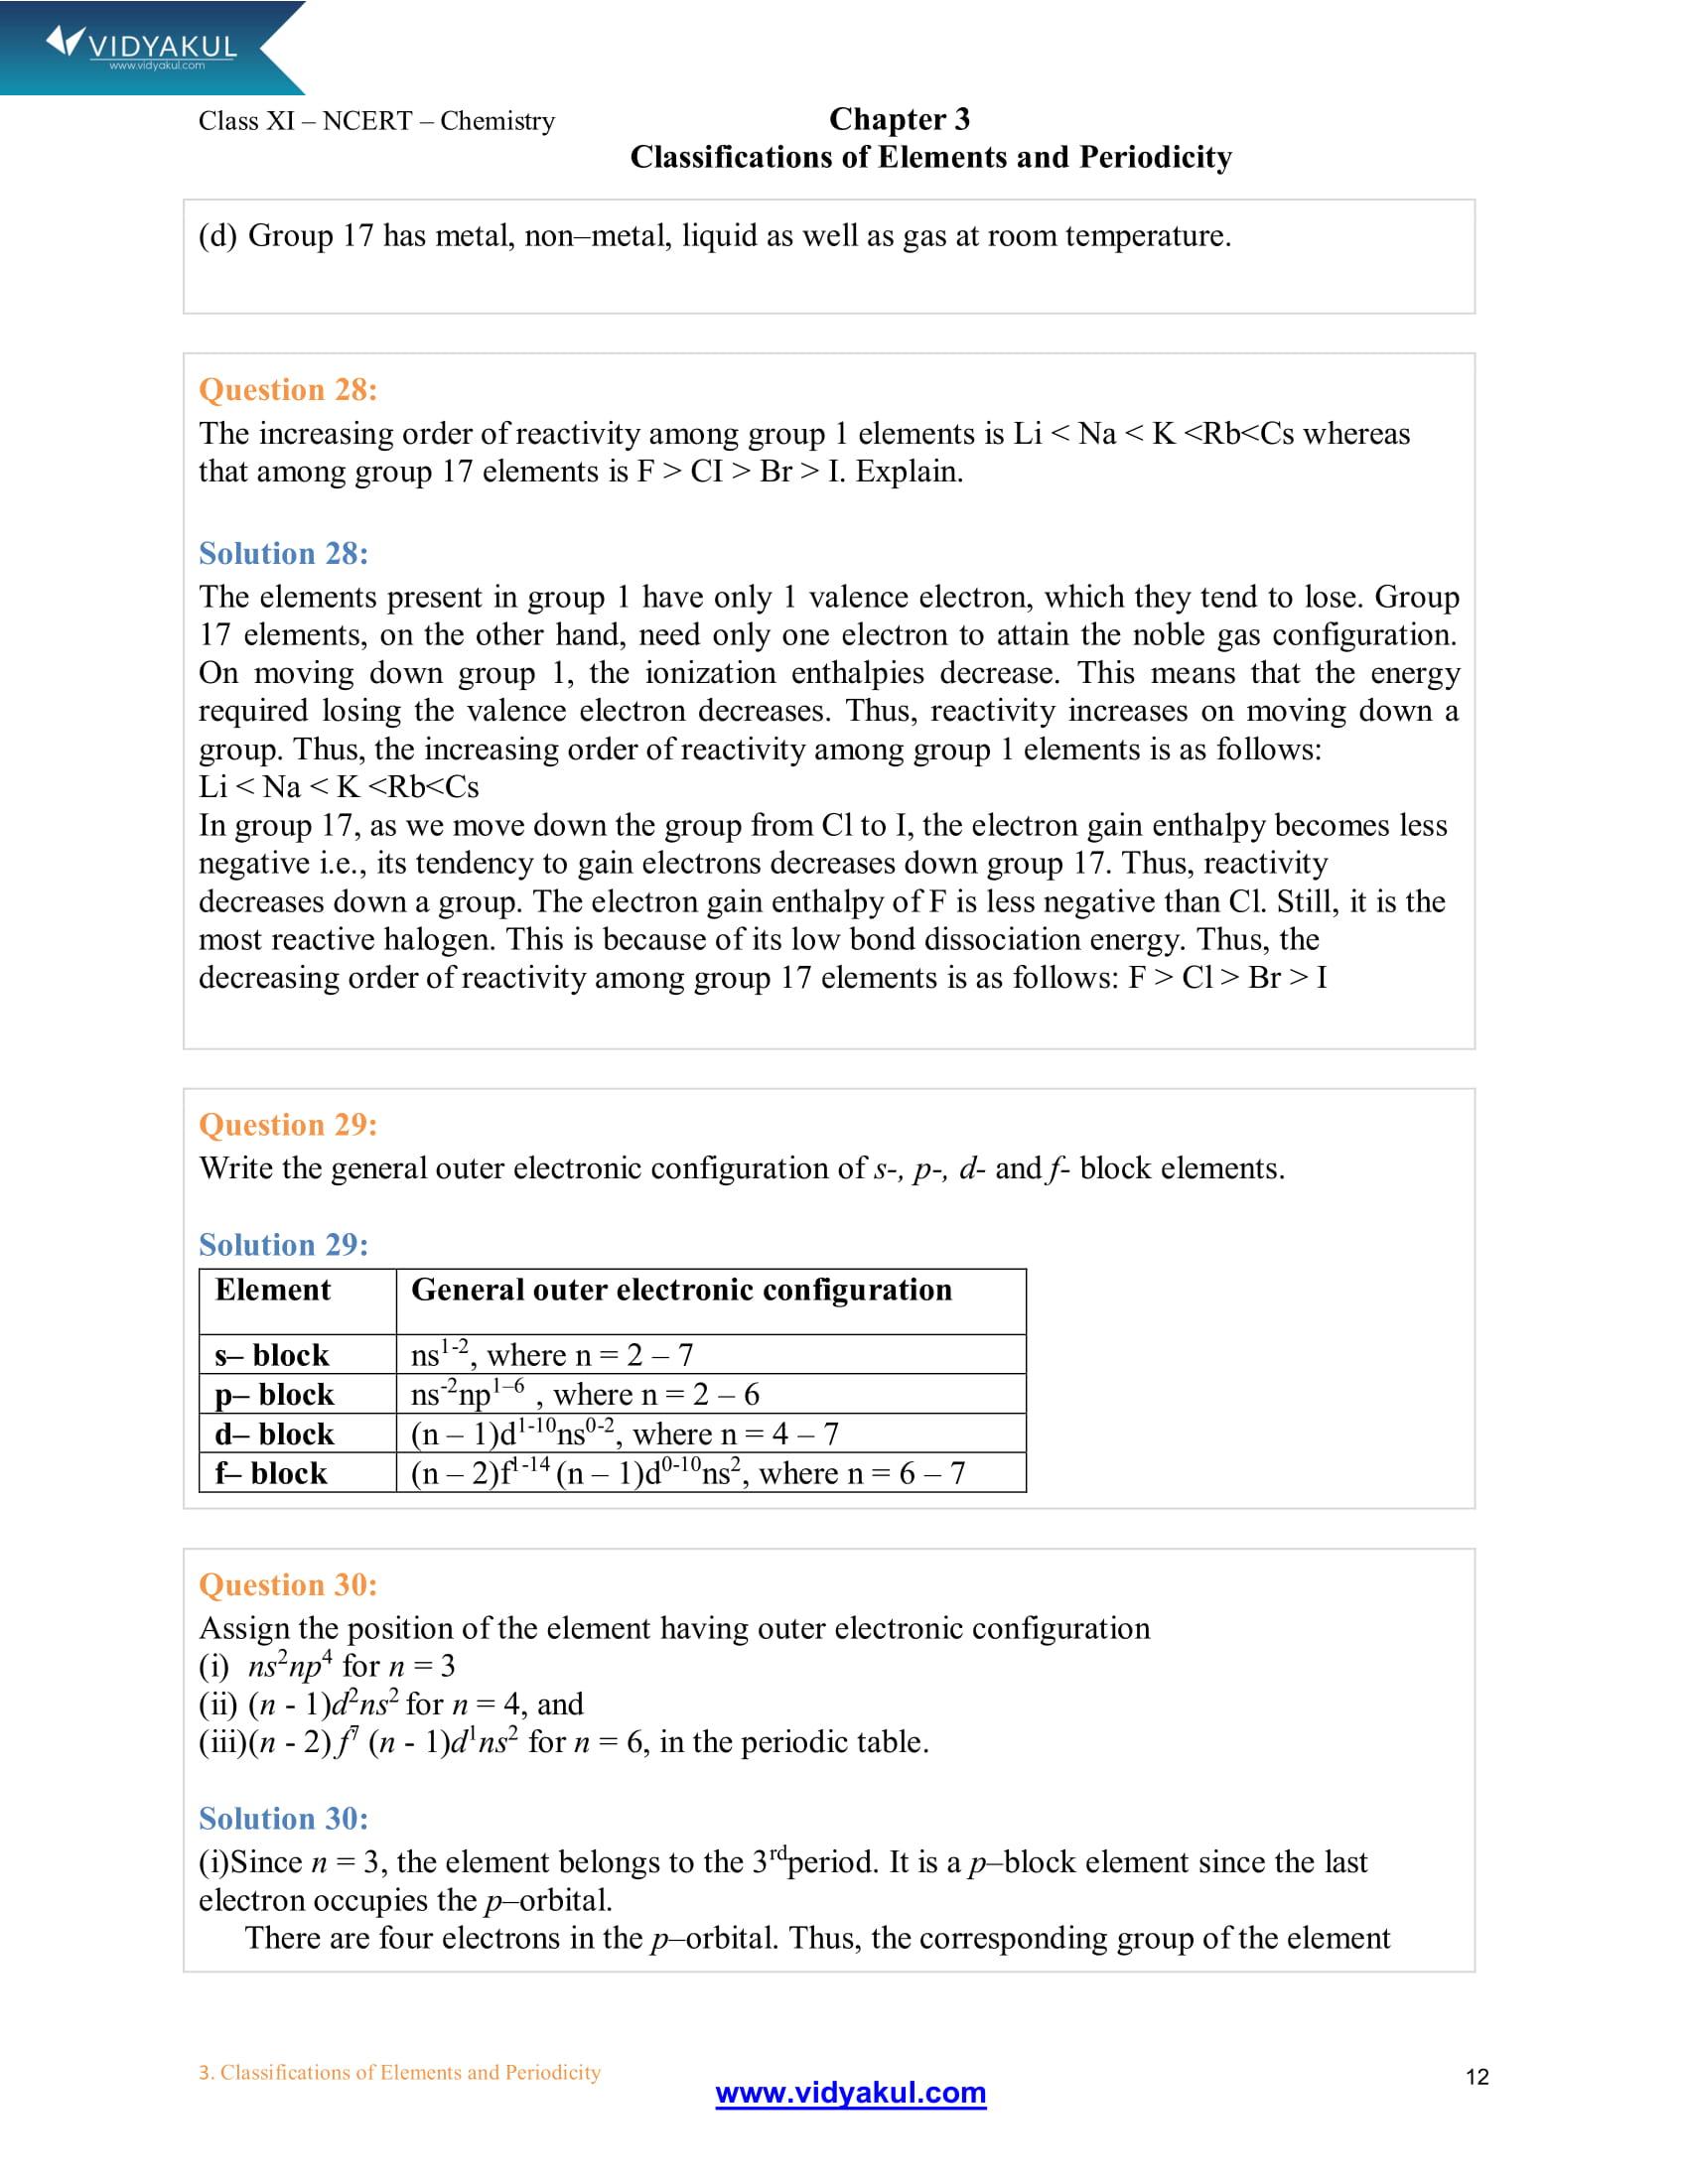 NCERT Solutions Class 11 Chemistry Chapter 3 | Vidyakul